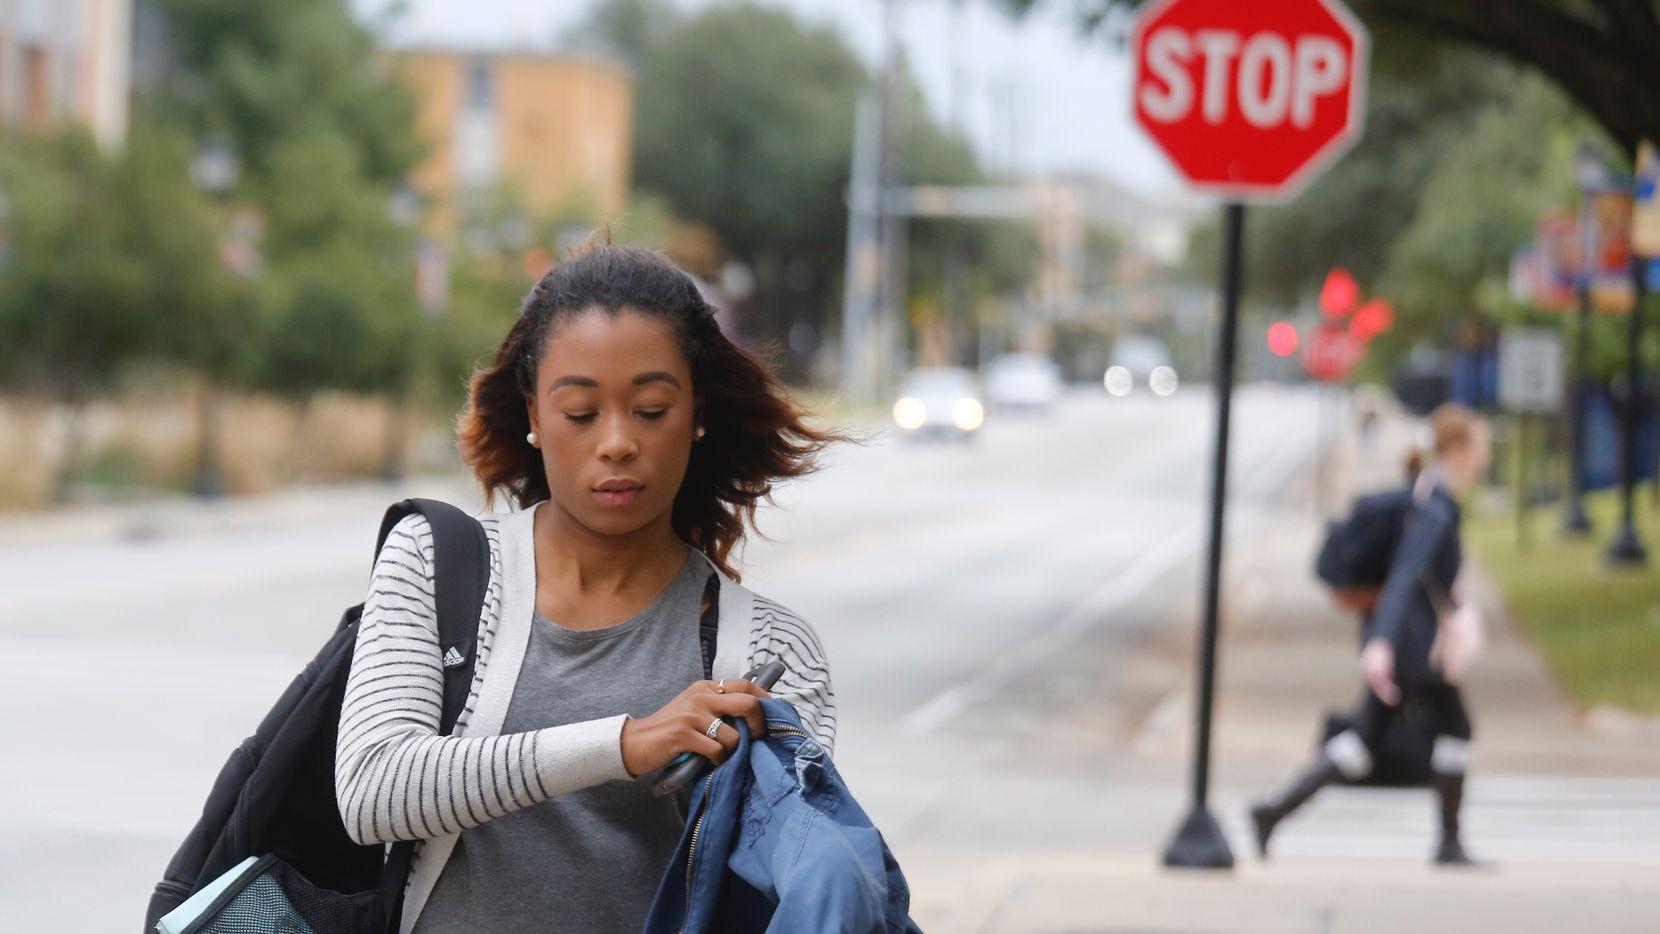 Hayley Woolen, a freshman at UT-Arlington, put on her jacket as she walked across the Arlington campus last year.